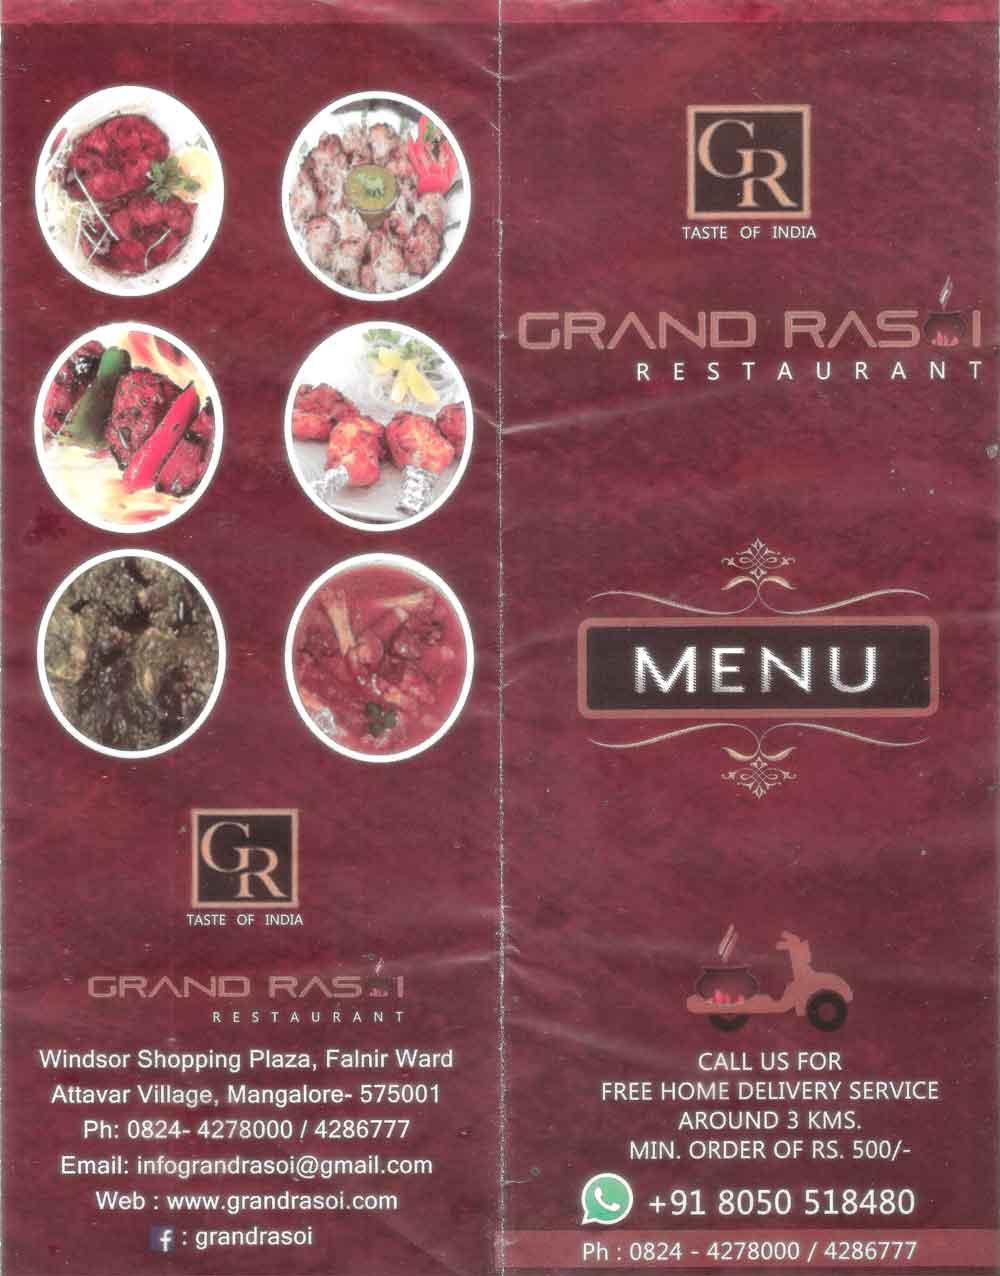 Food Menu - Grand Rasoi Restaurant - Attavar, Mangalore